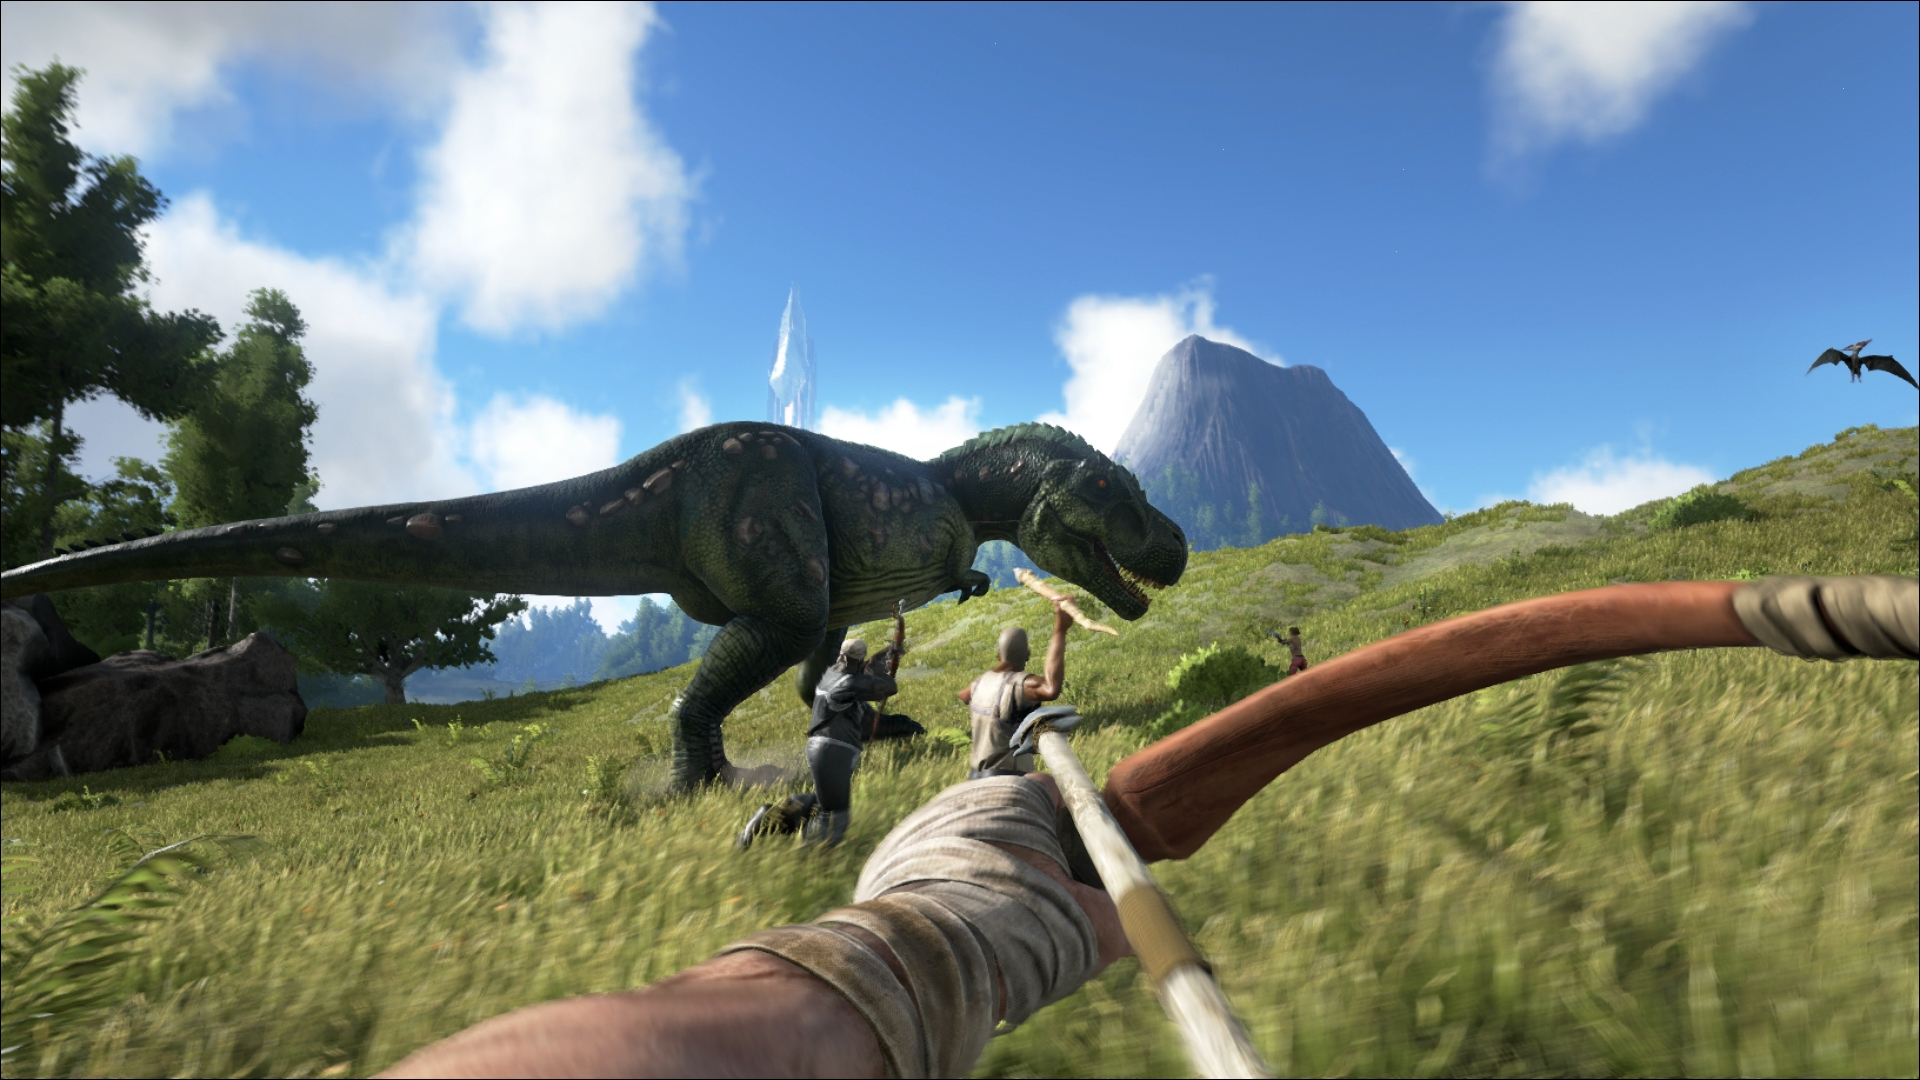 ark-survival-evolved-pc-screenshot-www.ovagames.com-02